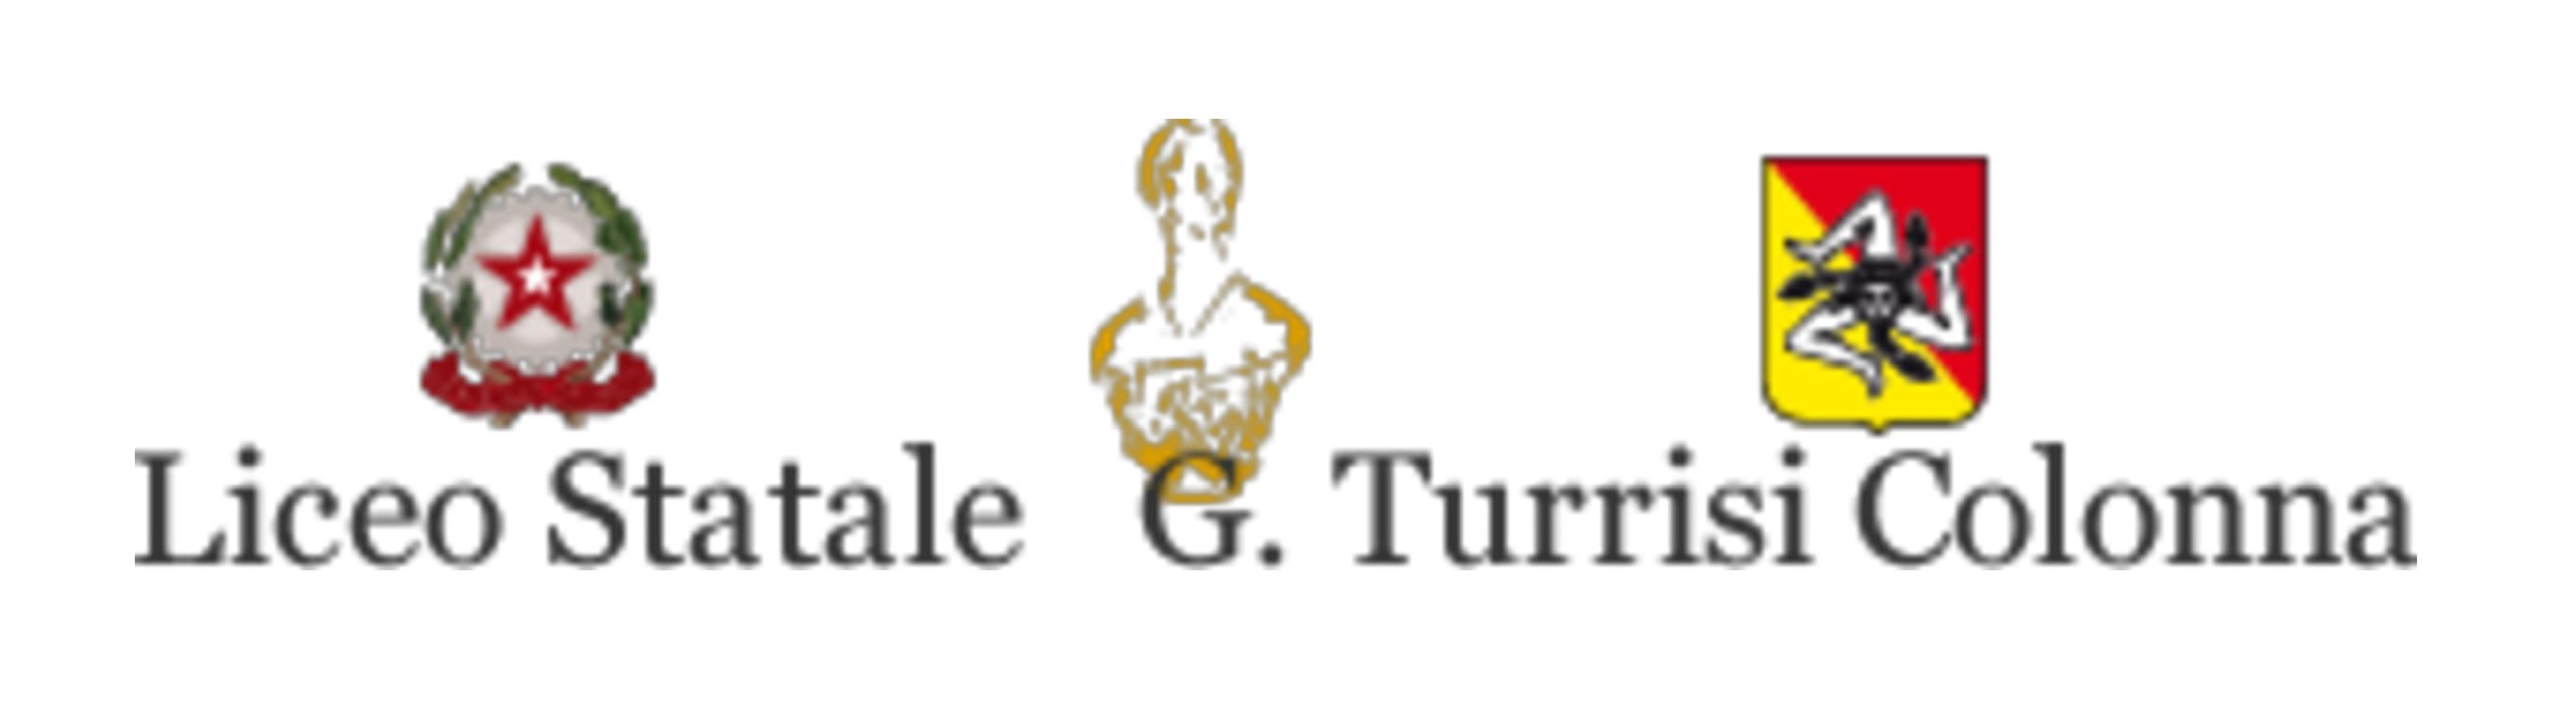 logo-Turrisi-Colonna